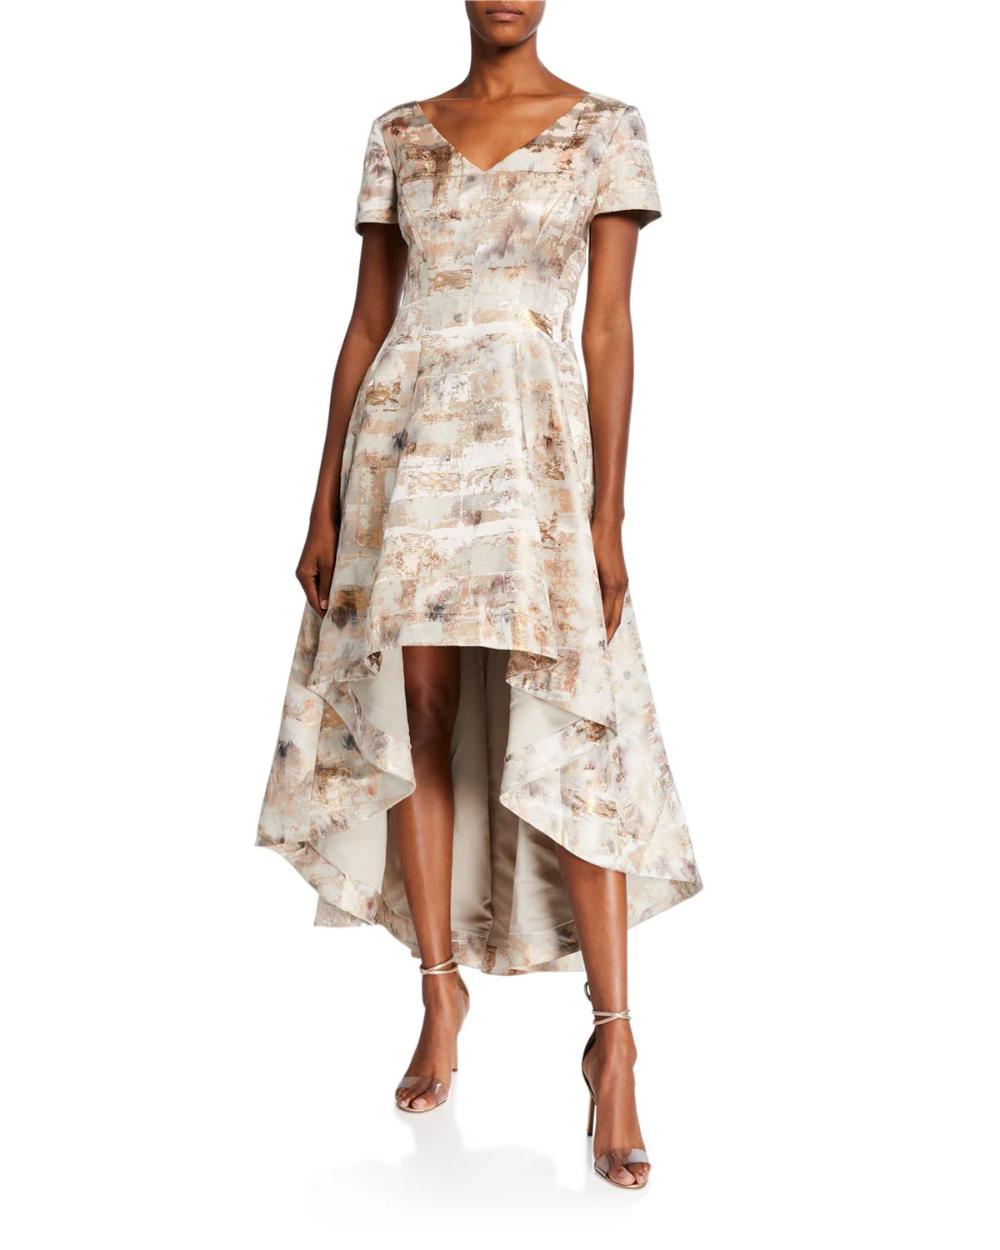 Shani Short Sleeve High Low Jacquard Dress Jacquard Dress Cocktail Dress Lace Embroidered Cocktail Dress [ 1250 x 1000 Pixel ]